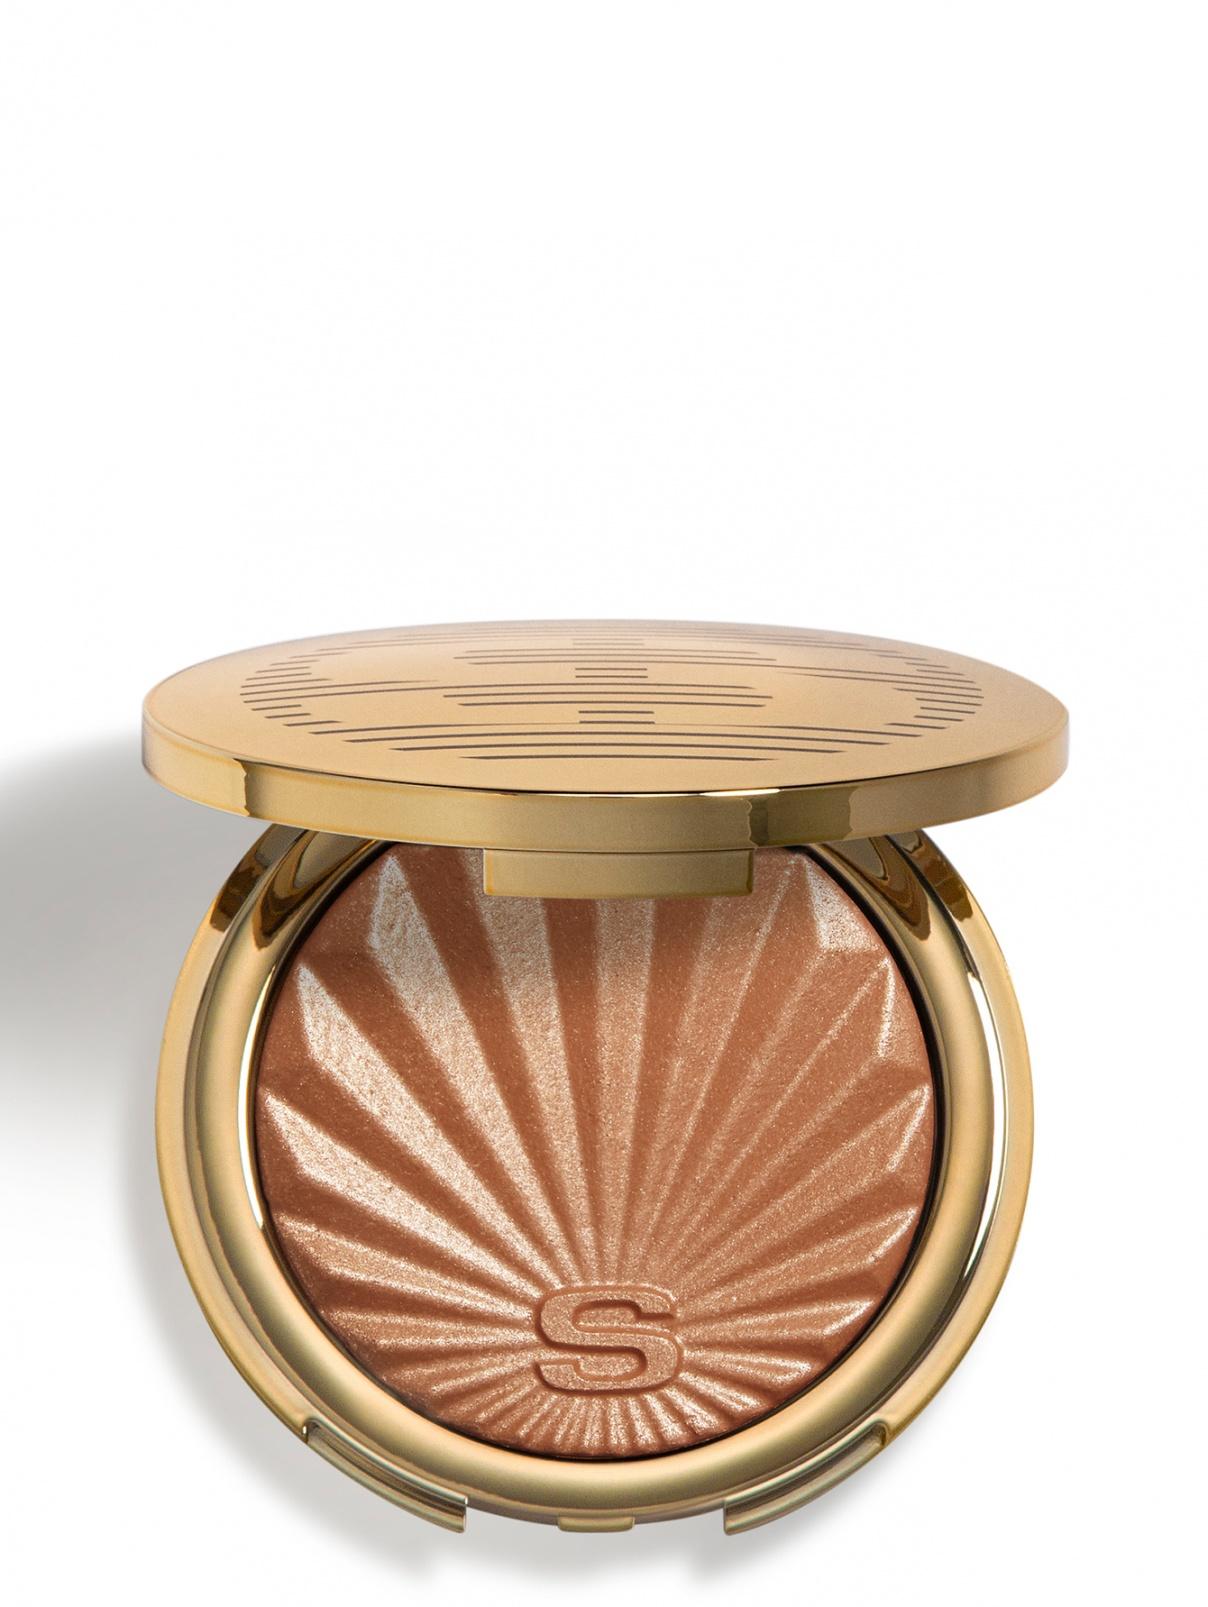 Пудра оттеночная - Phyto-Poudre Compact Sisley  –  Общий вид